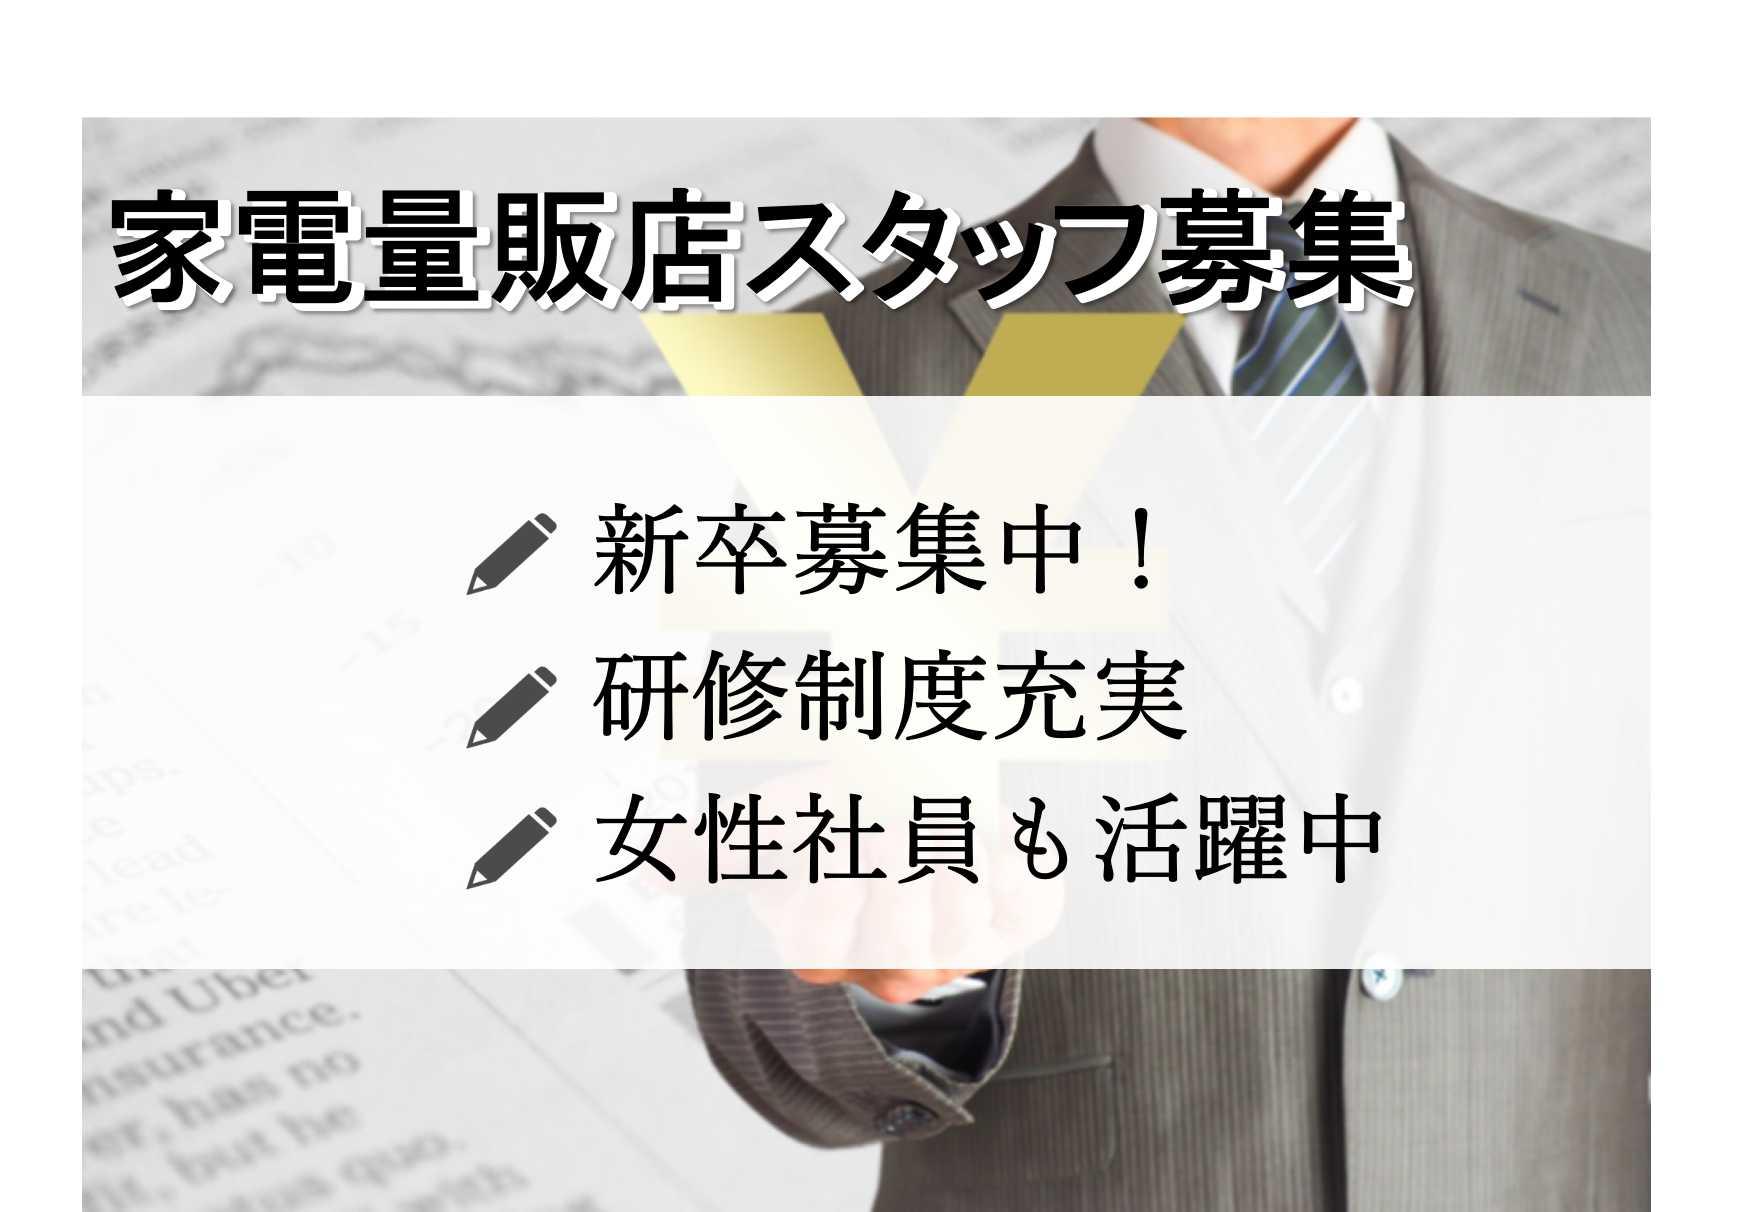 【名古屋市中区】新卒さん歓迎!研修制度充実!家電量販店スタッフ【即面談可能】 イメージ